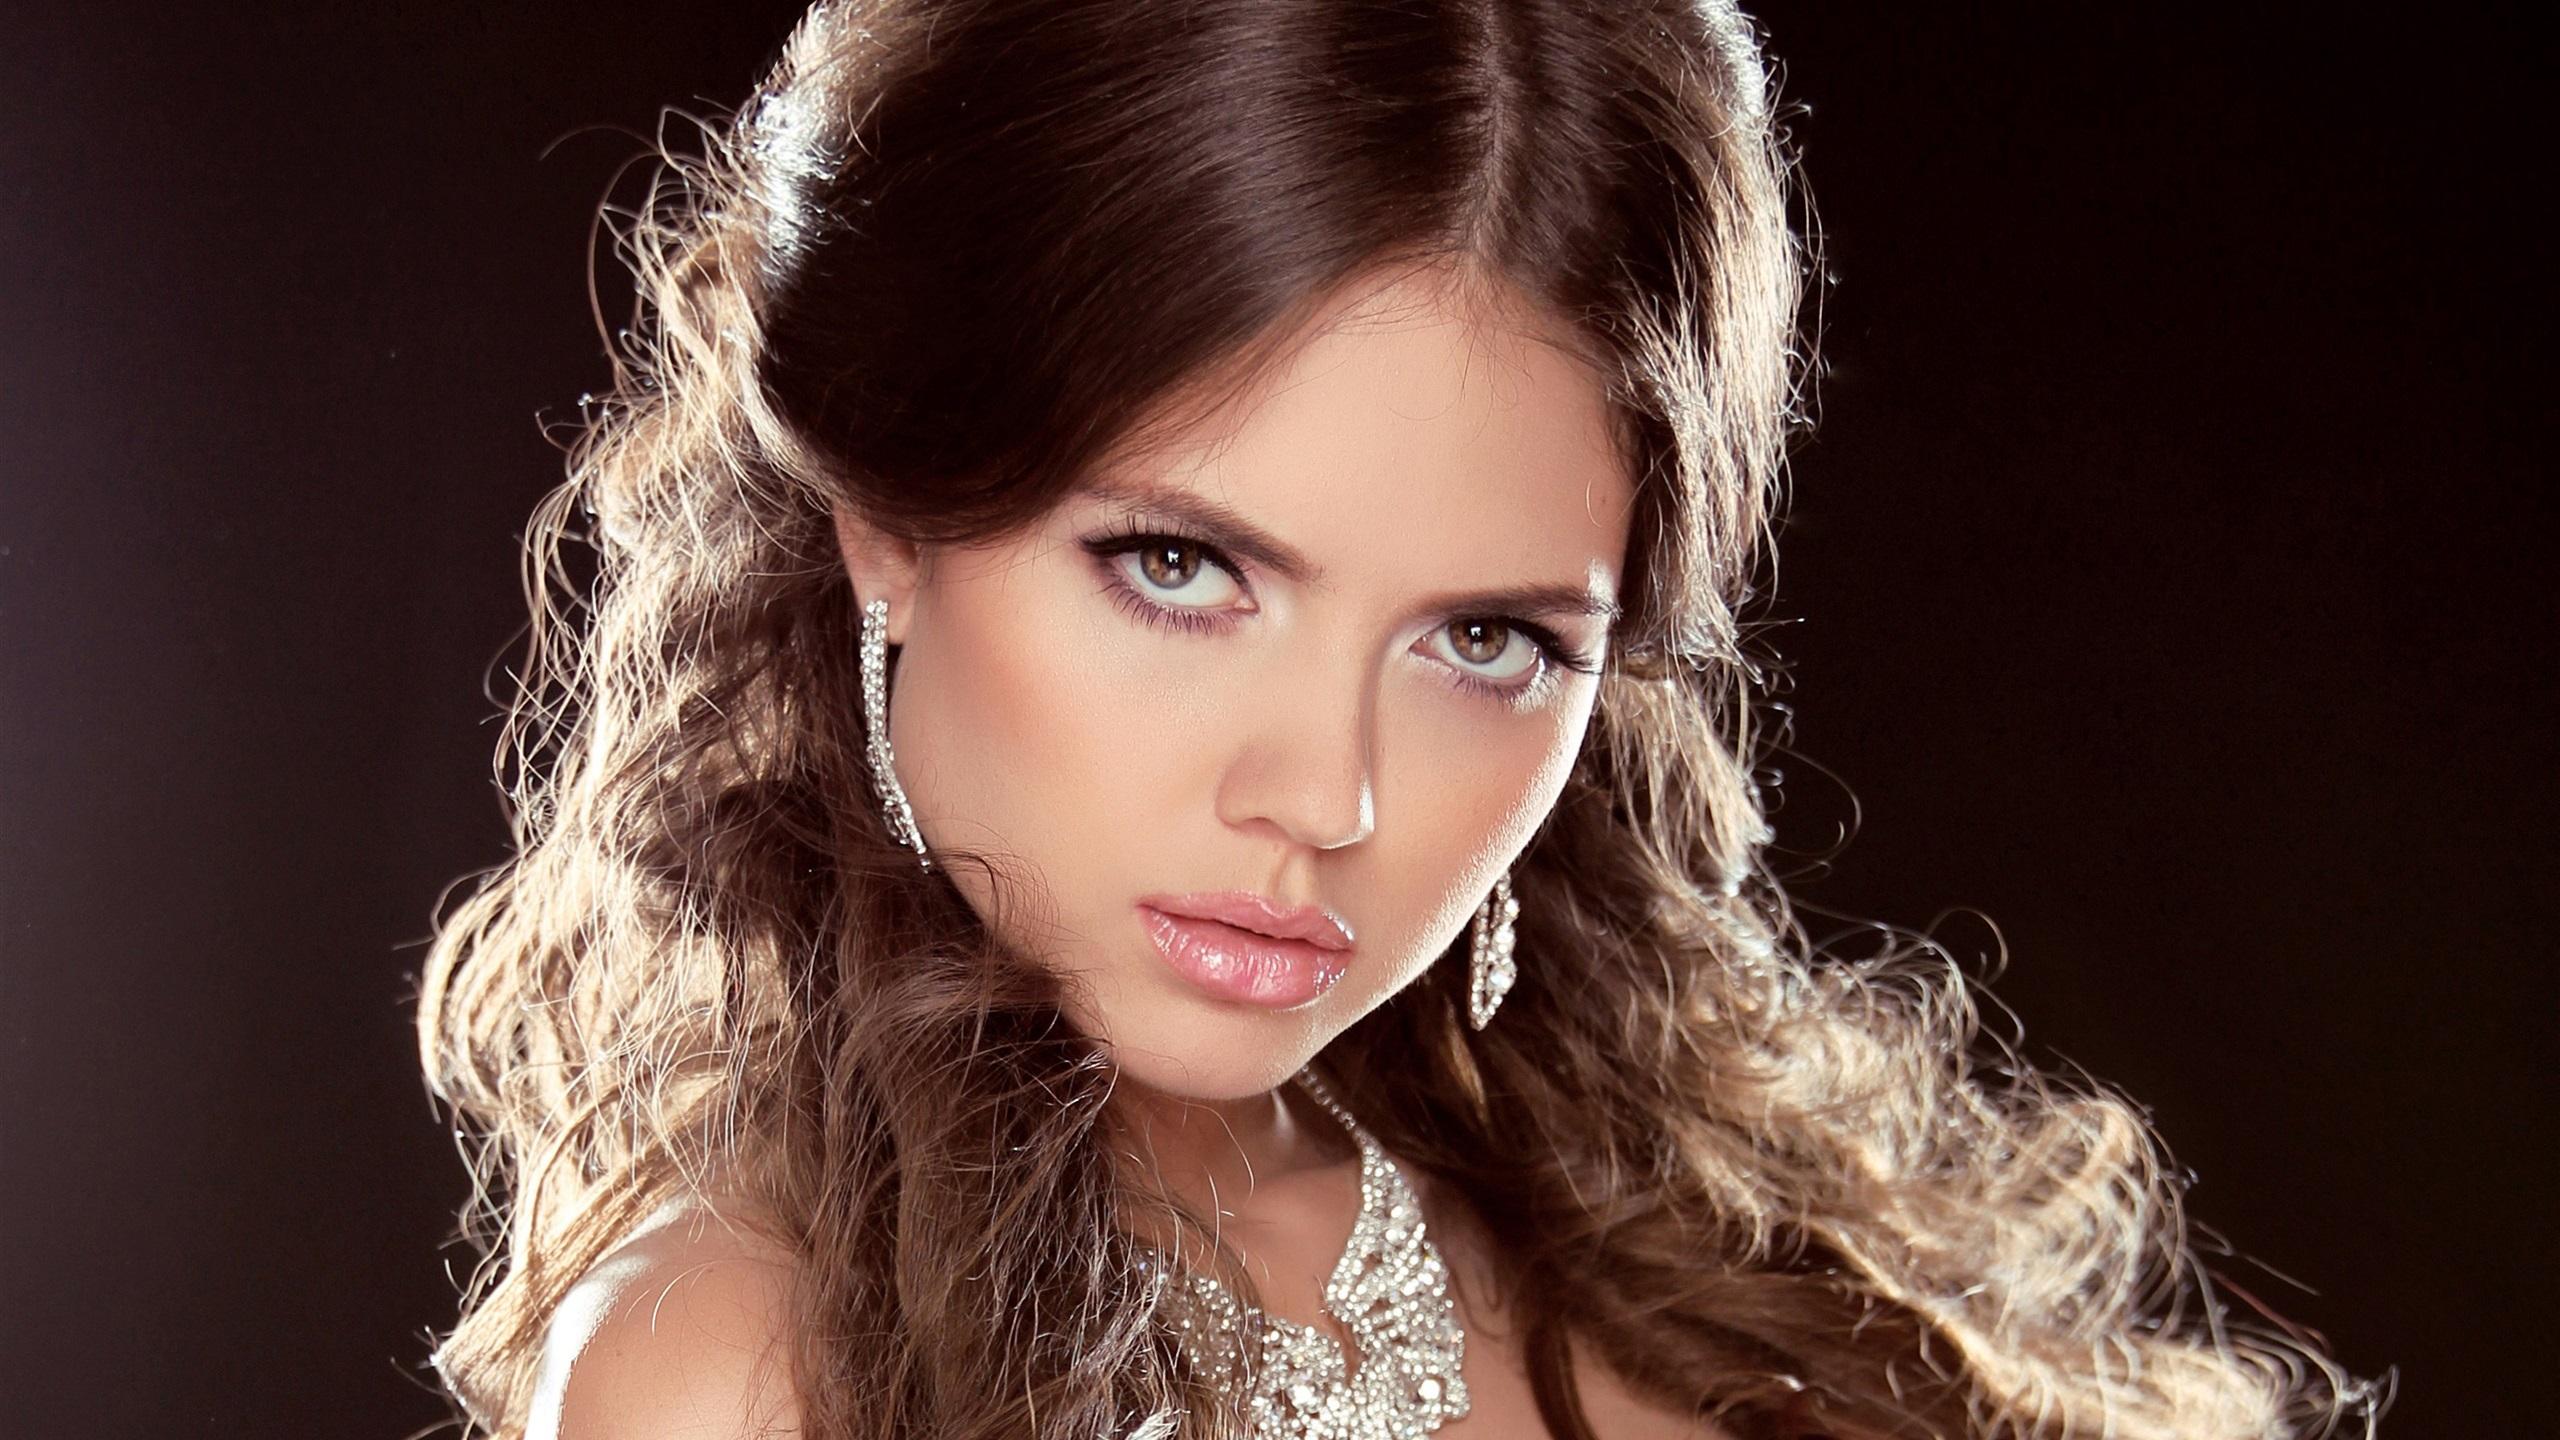 Fonds d 39 cran t l charger 2560x1440 maquillage fille for Fond ecran qhd